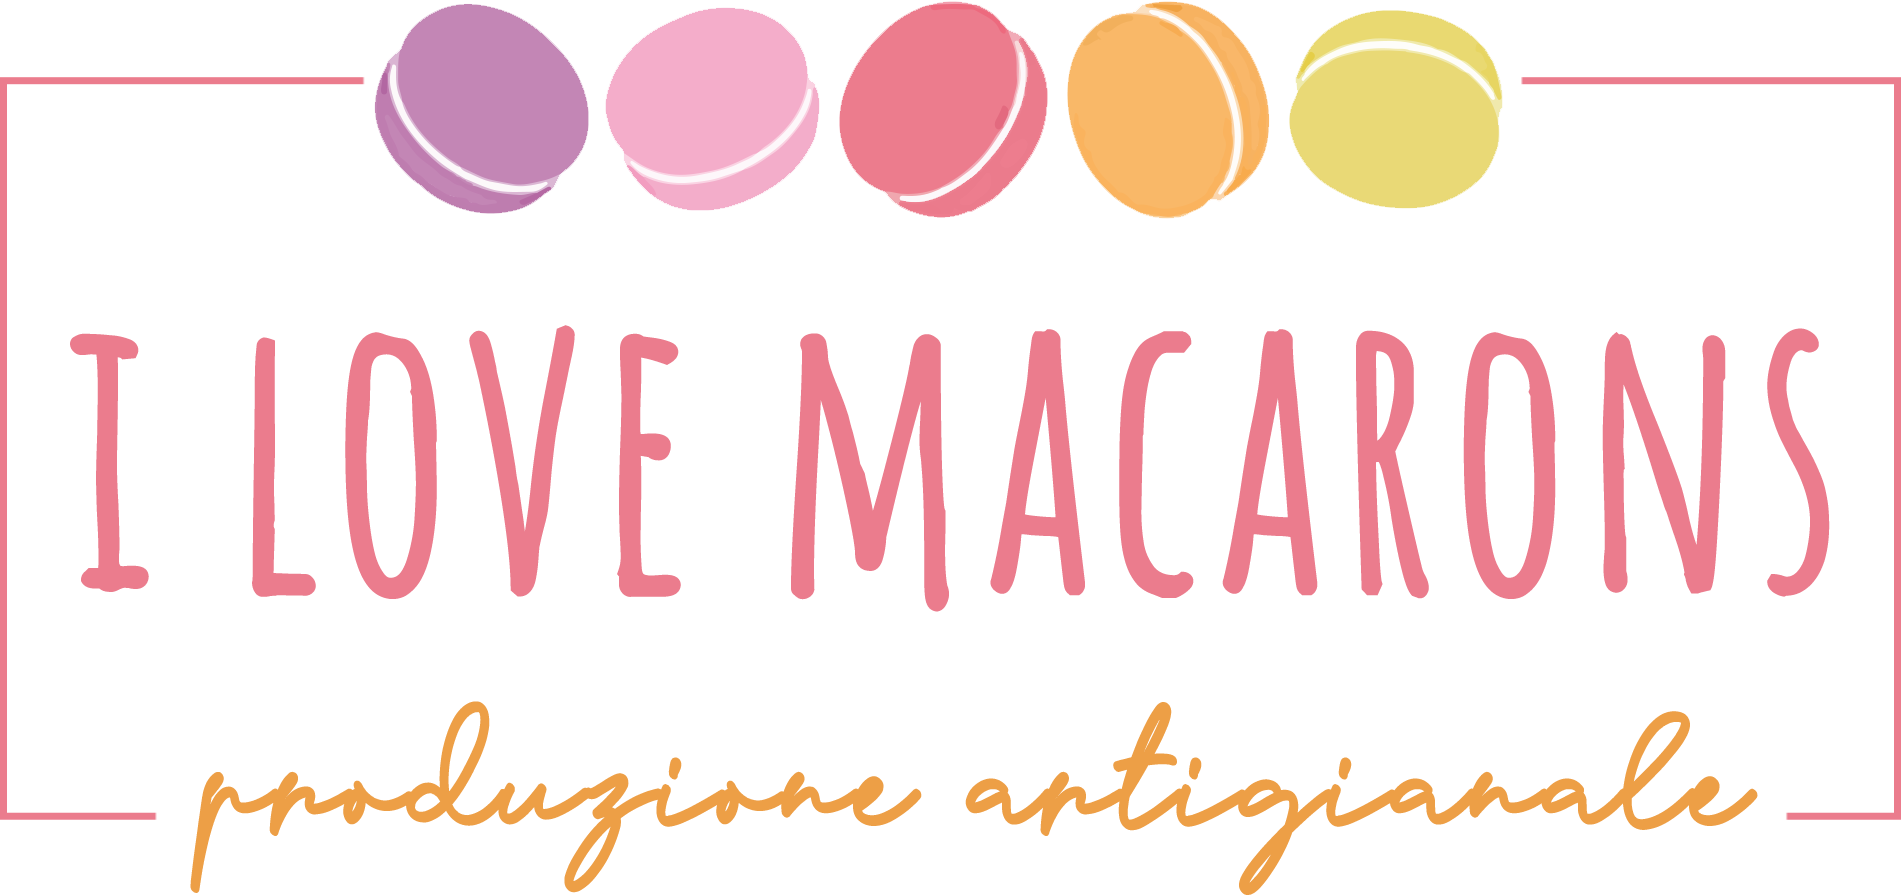 i love macarons logo